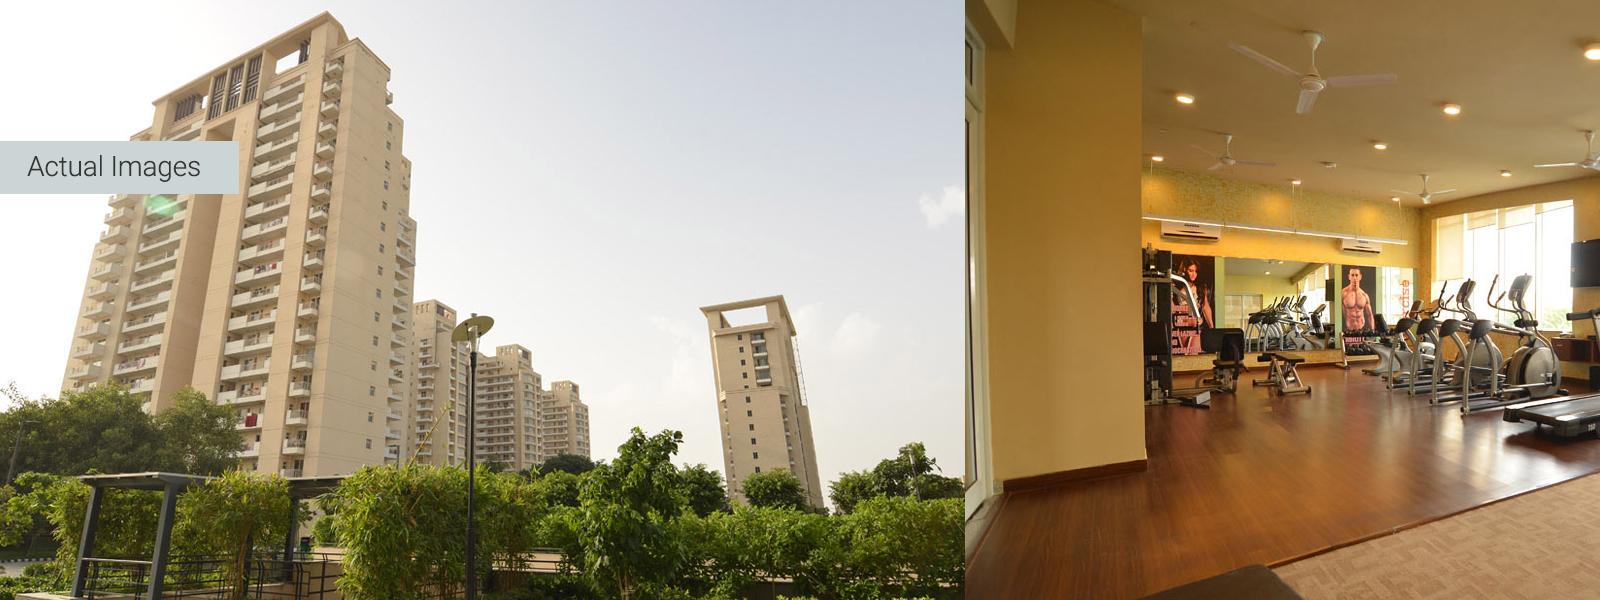 Bestech Park View spa Sector 47 Gurgaon